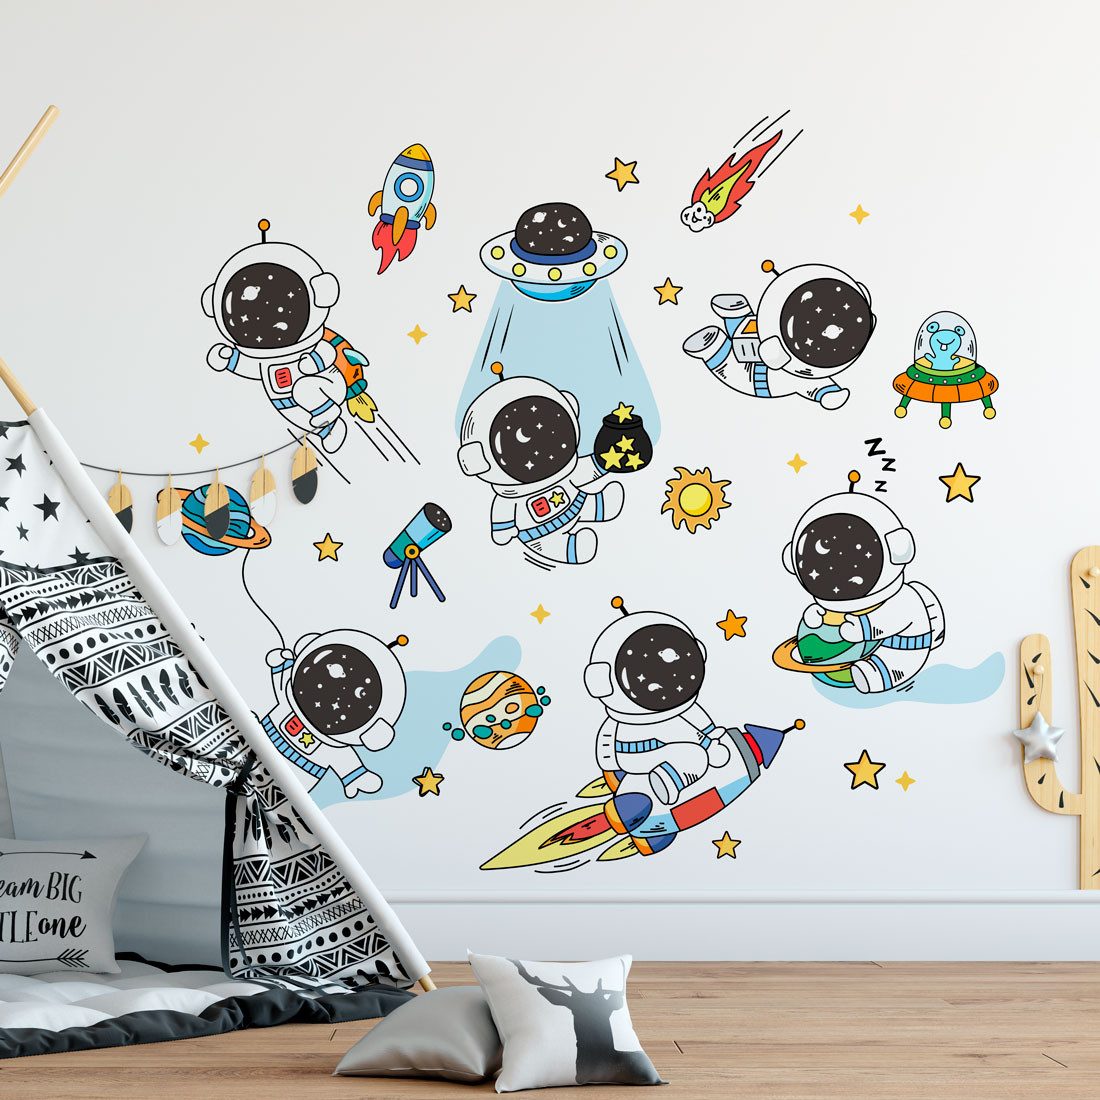 Adesivo de Parede Infantil Astronautas